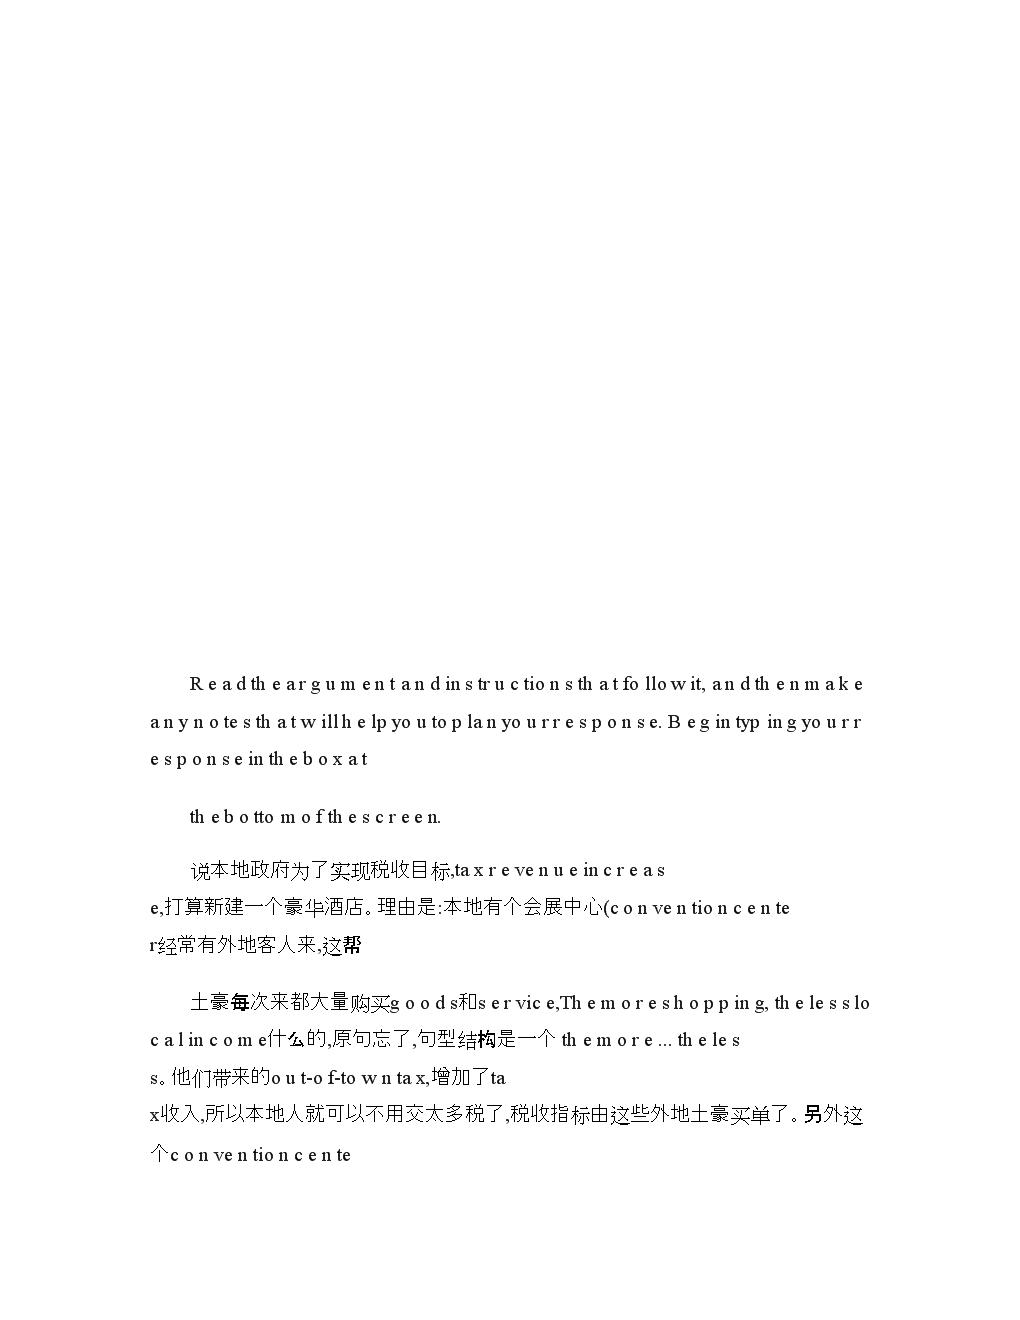 1735gmat全真AWA写作模拟界面 - 图文-.doc